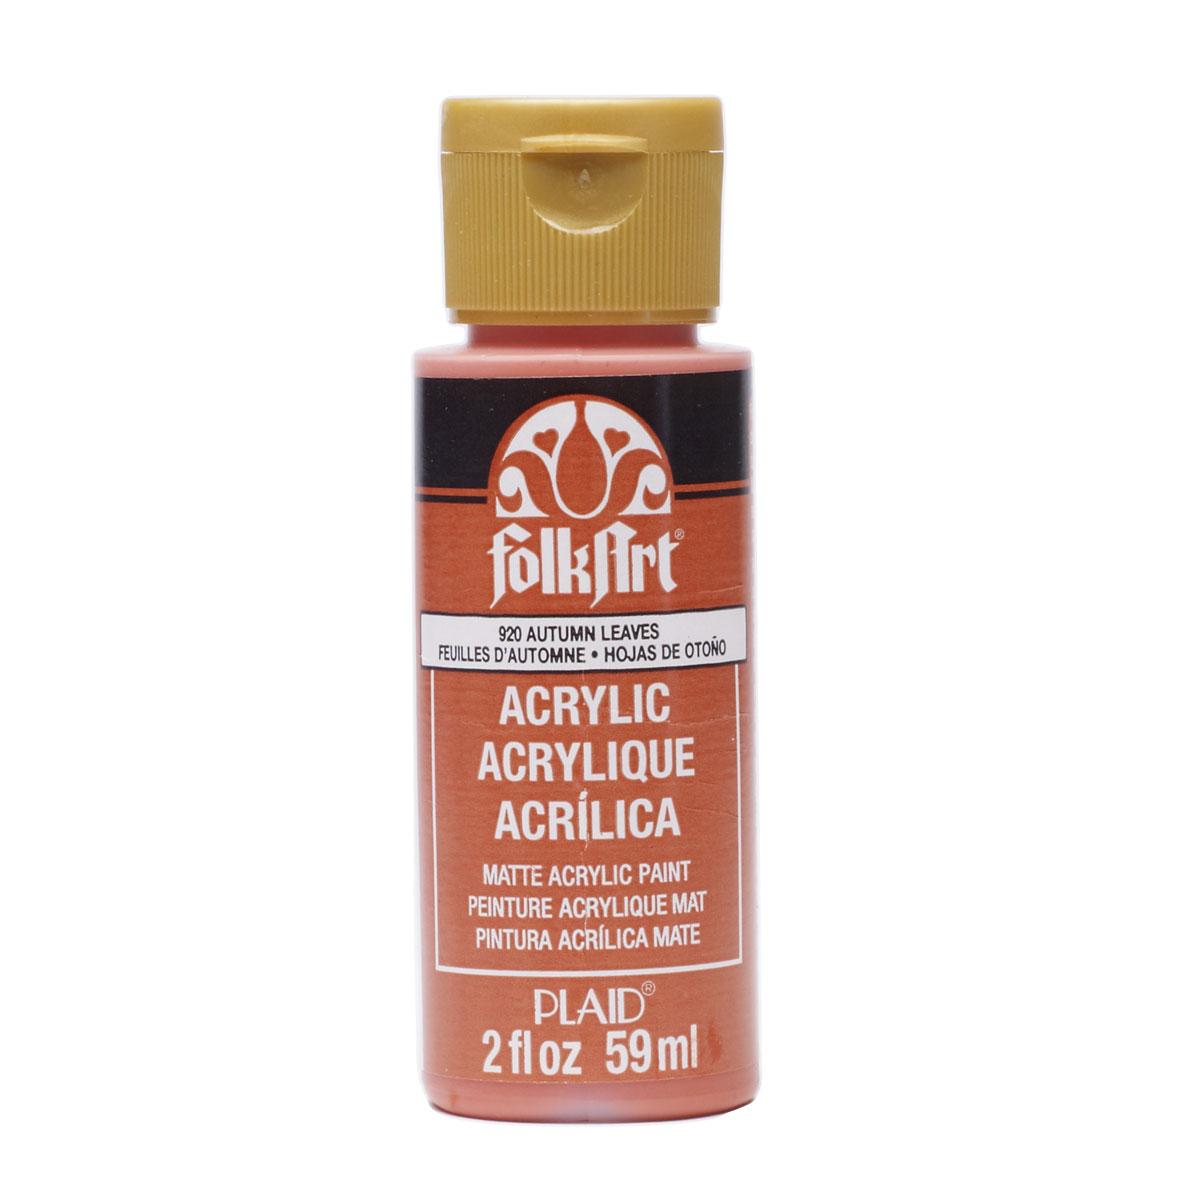 FolkArt ® Acrylic Colors - Autumn Leaves, 2 oz. - 920